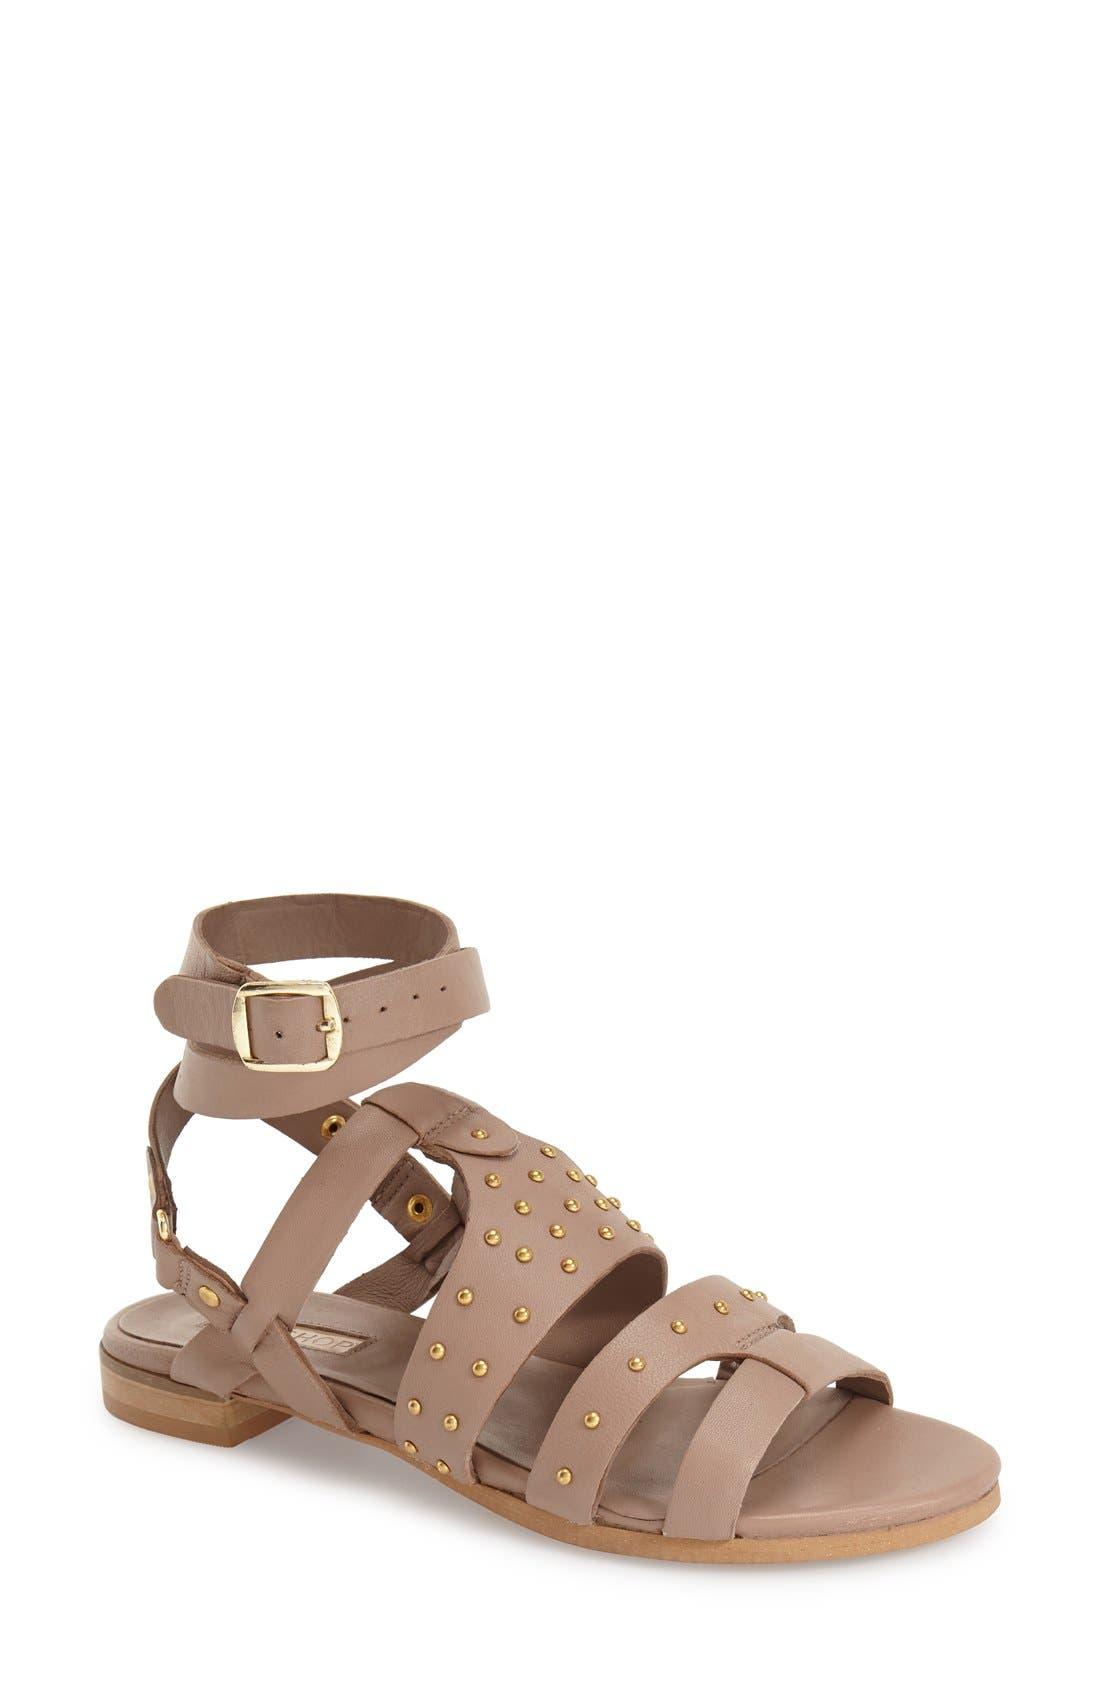 Alternate Image 1 Selected - Topshop 'Flame' Stud Wraparound Ankle Strap Sandal (Women)